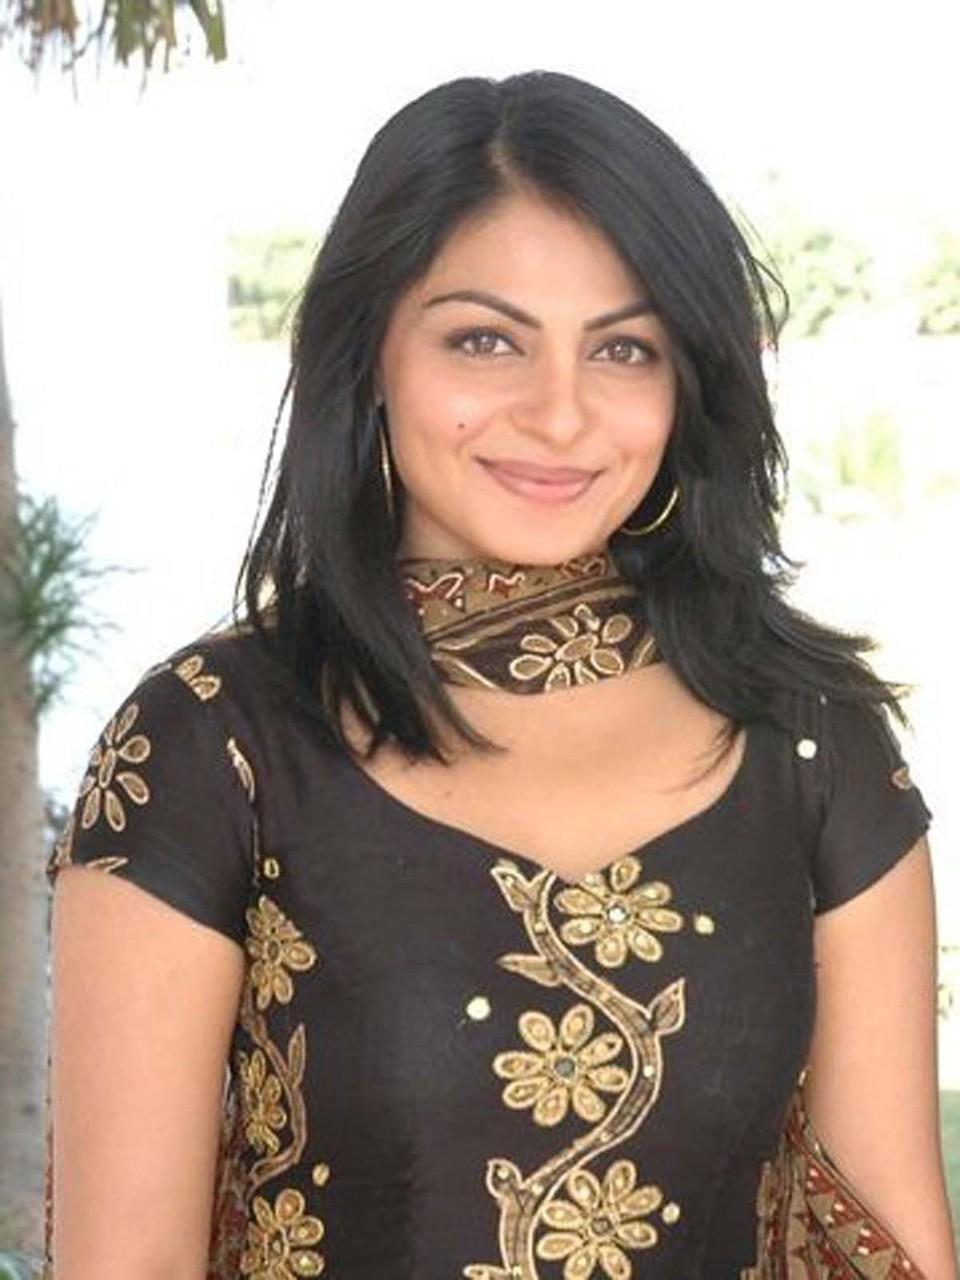 Neeru bajwa photos